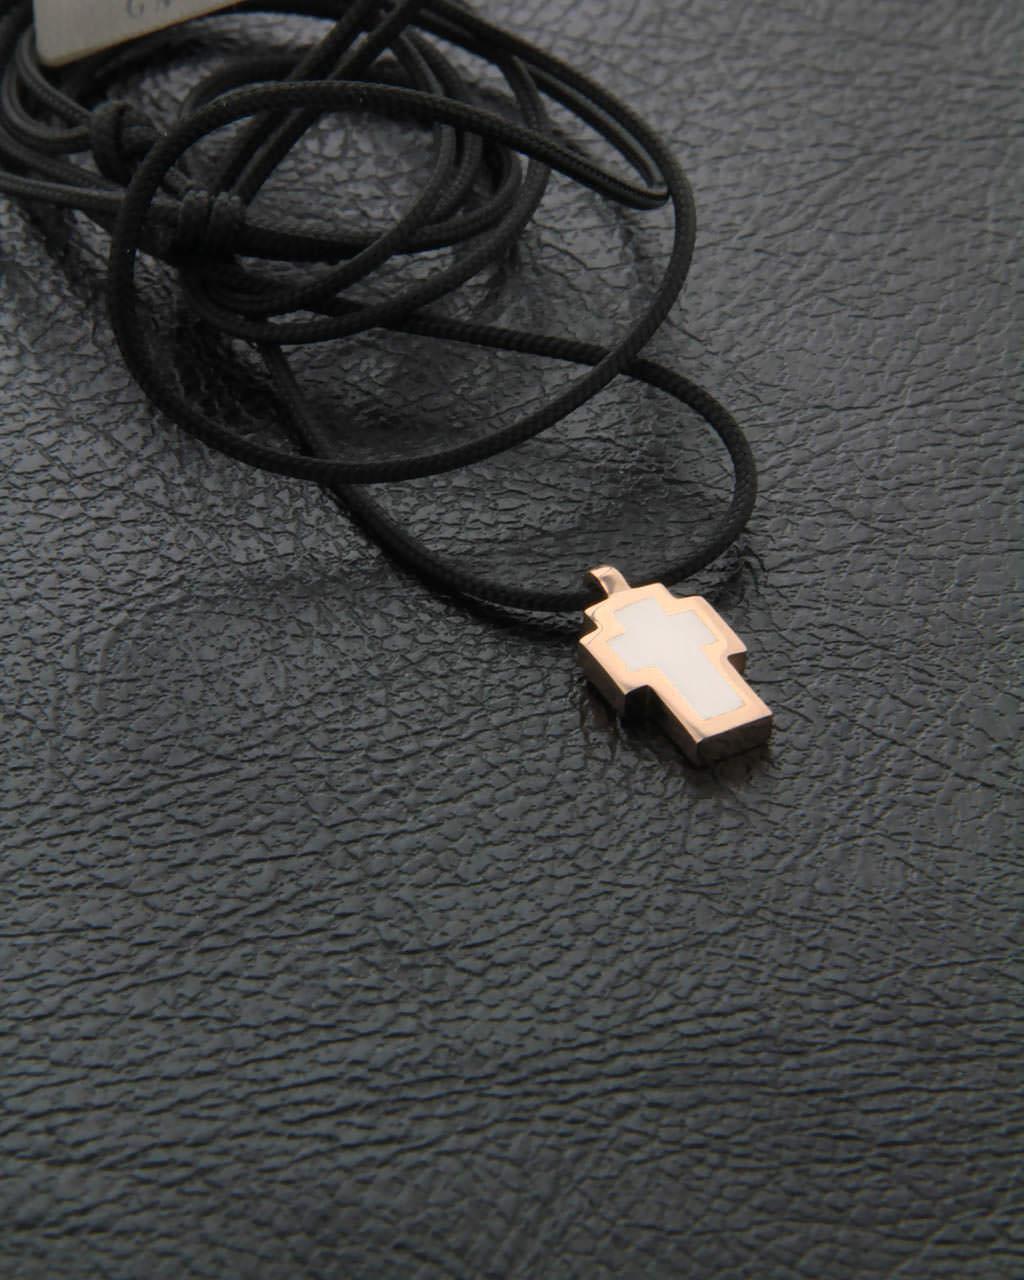 Very Gavello σταυρός Tattoo VPTA-X-R2   κοσμηματα σταυροί σταυροί ροζ χρυσό